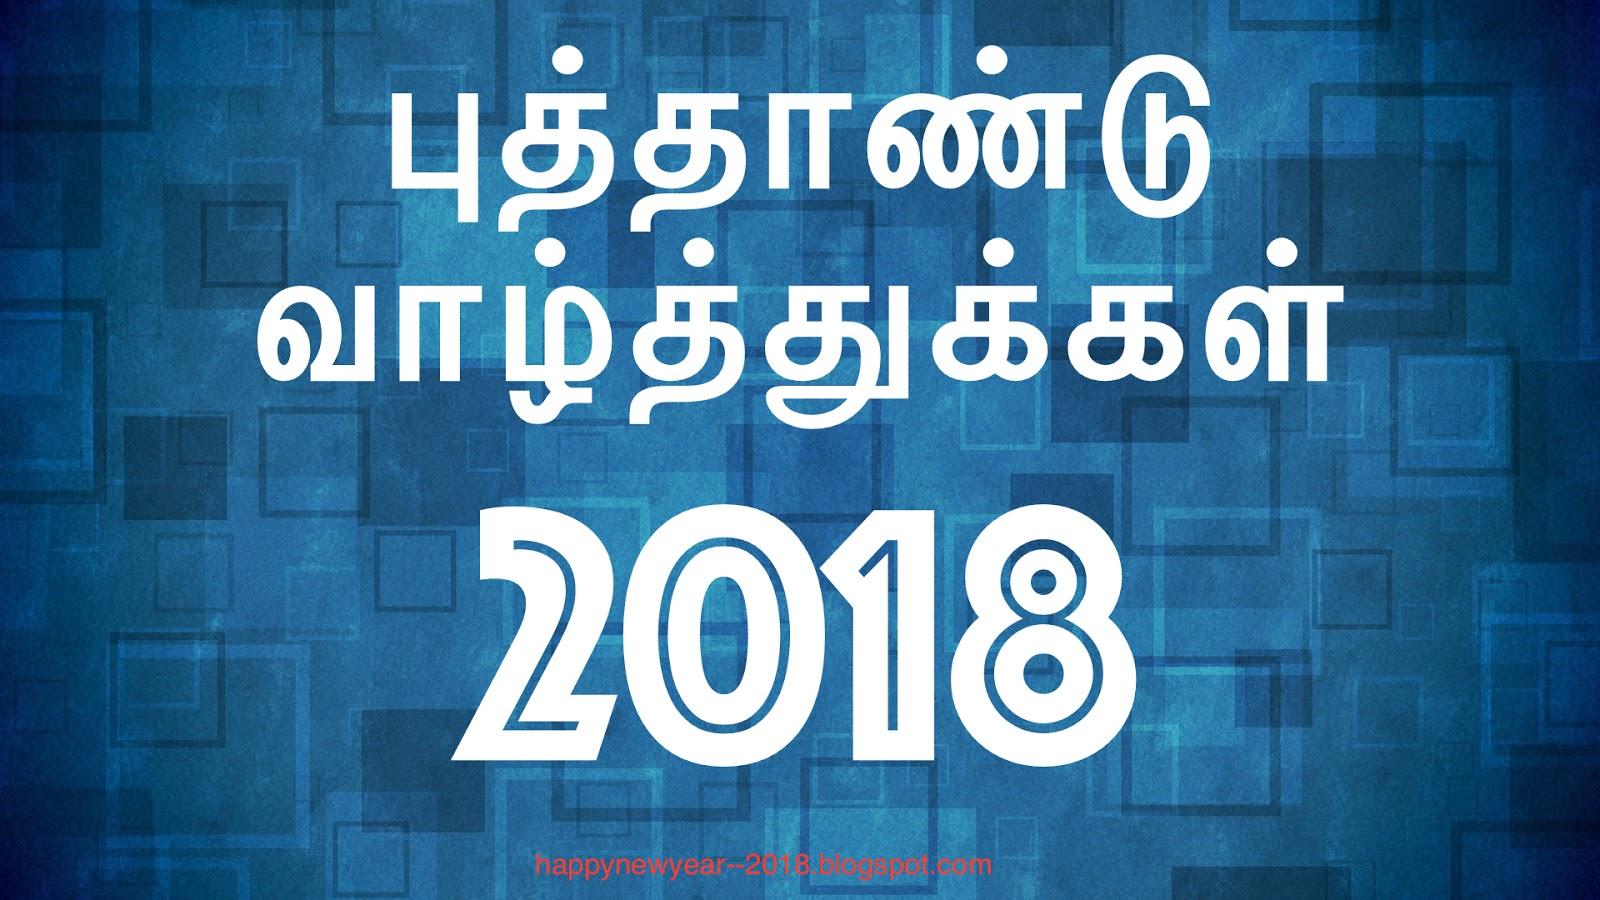 Happy New Year 2018 Tamil Wishes u0026 Wallpapers - W3Tutorials Happy